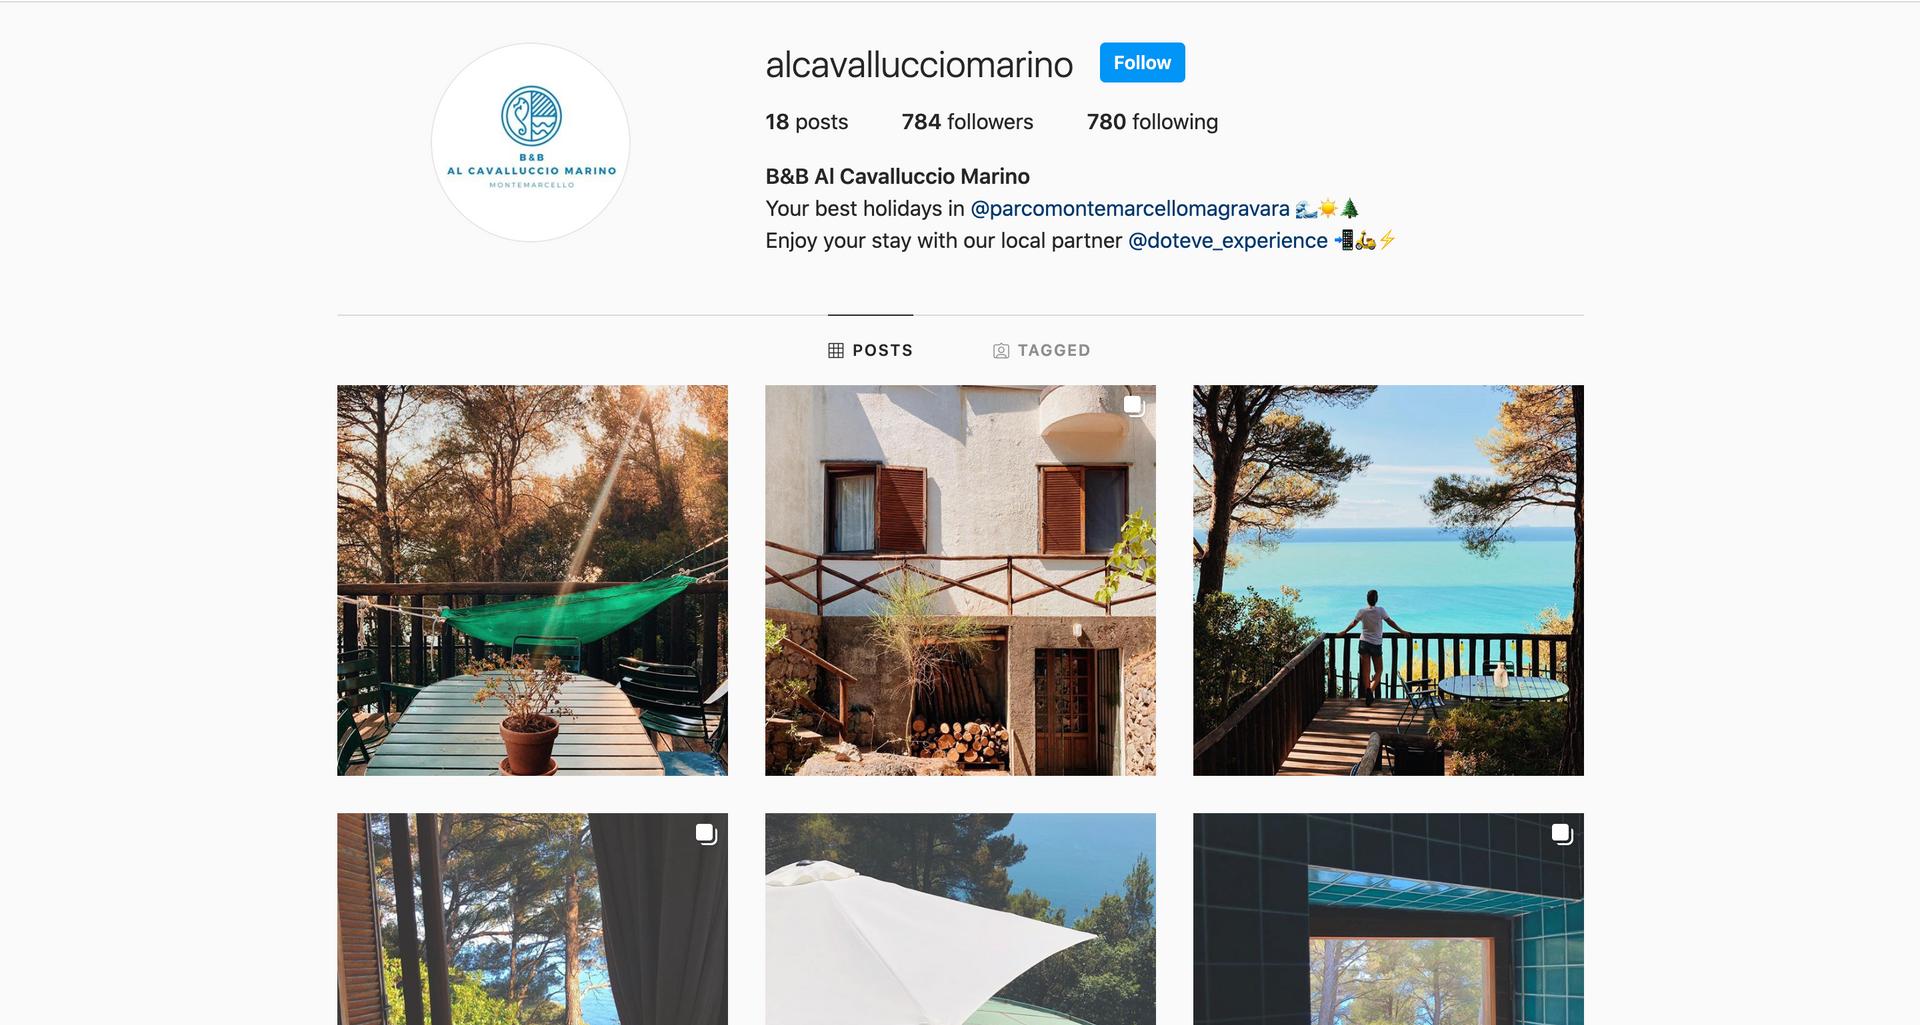 Al Cavalluccio Marino Instagram